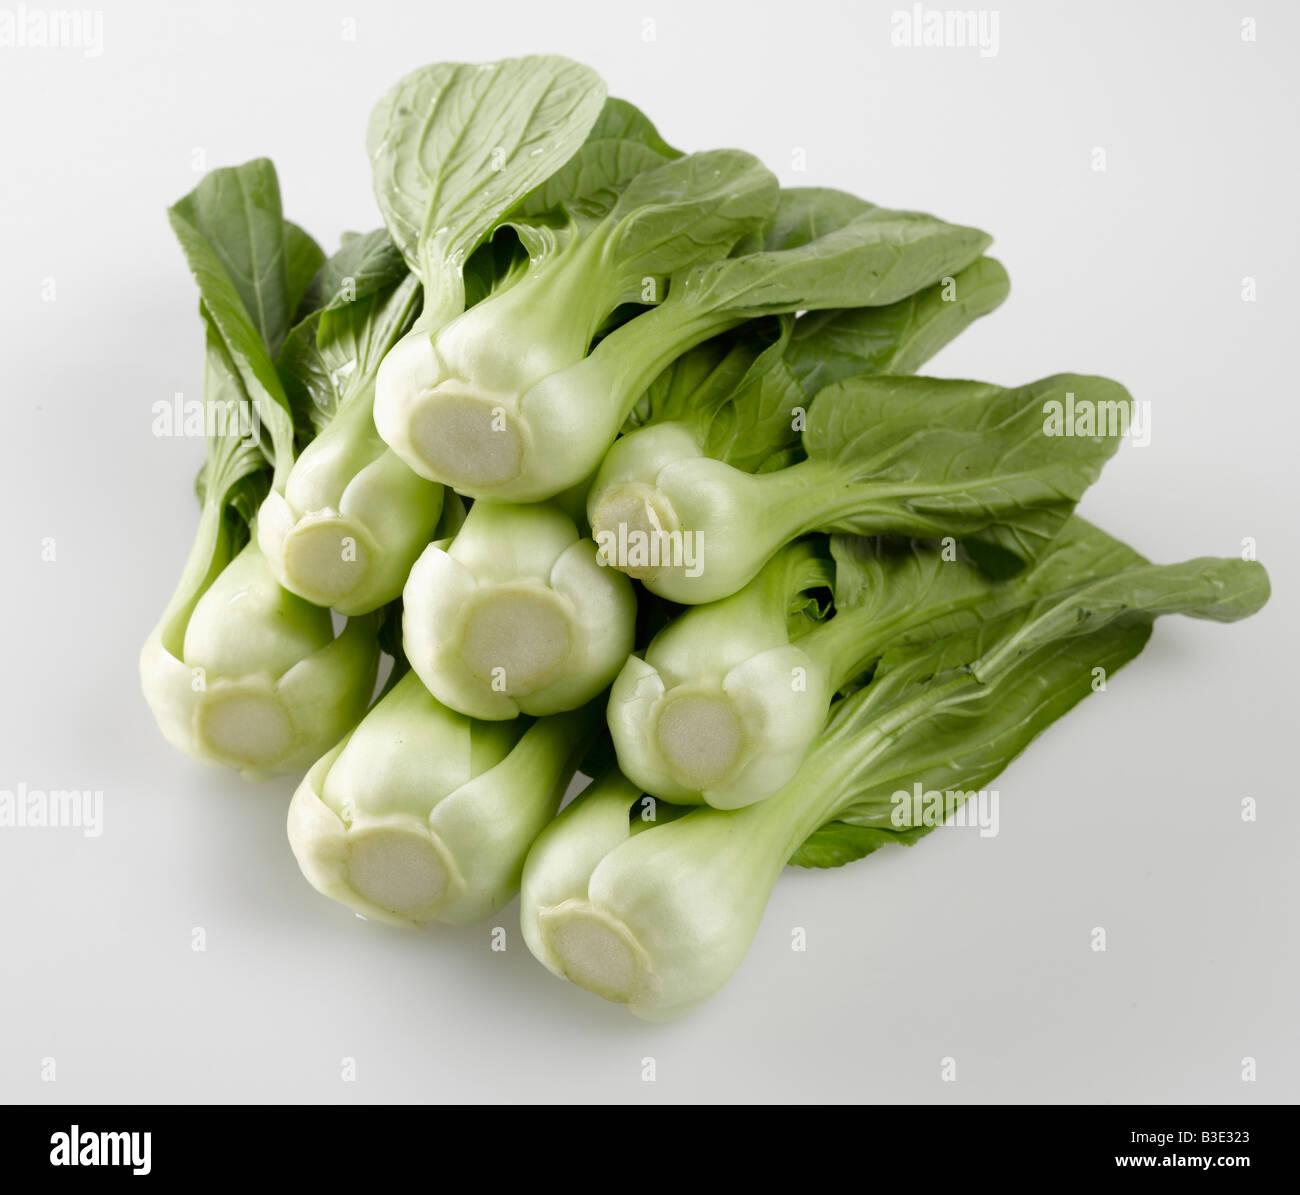 Bok choy, Chinese celery cabbage - Stock Image